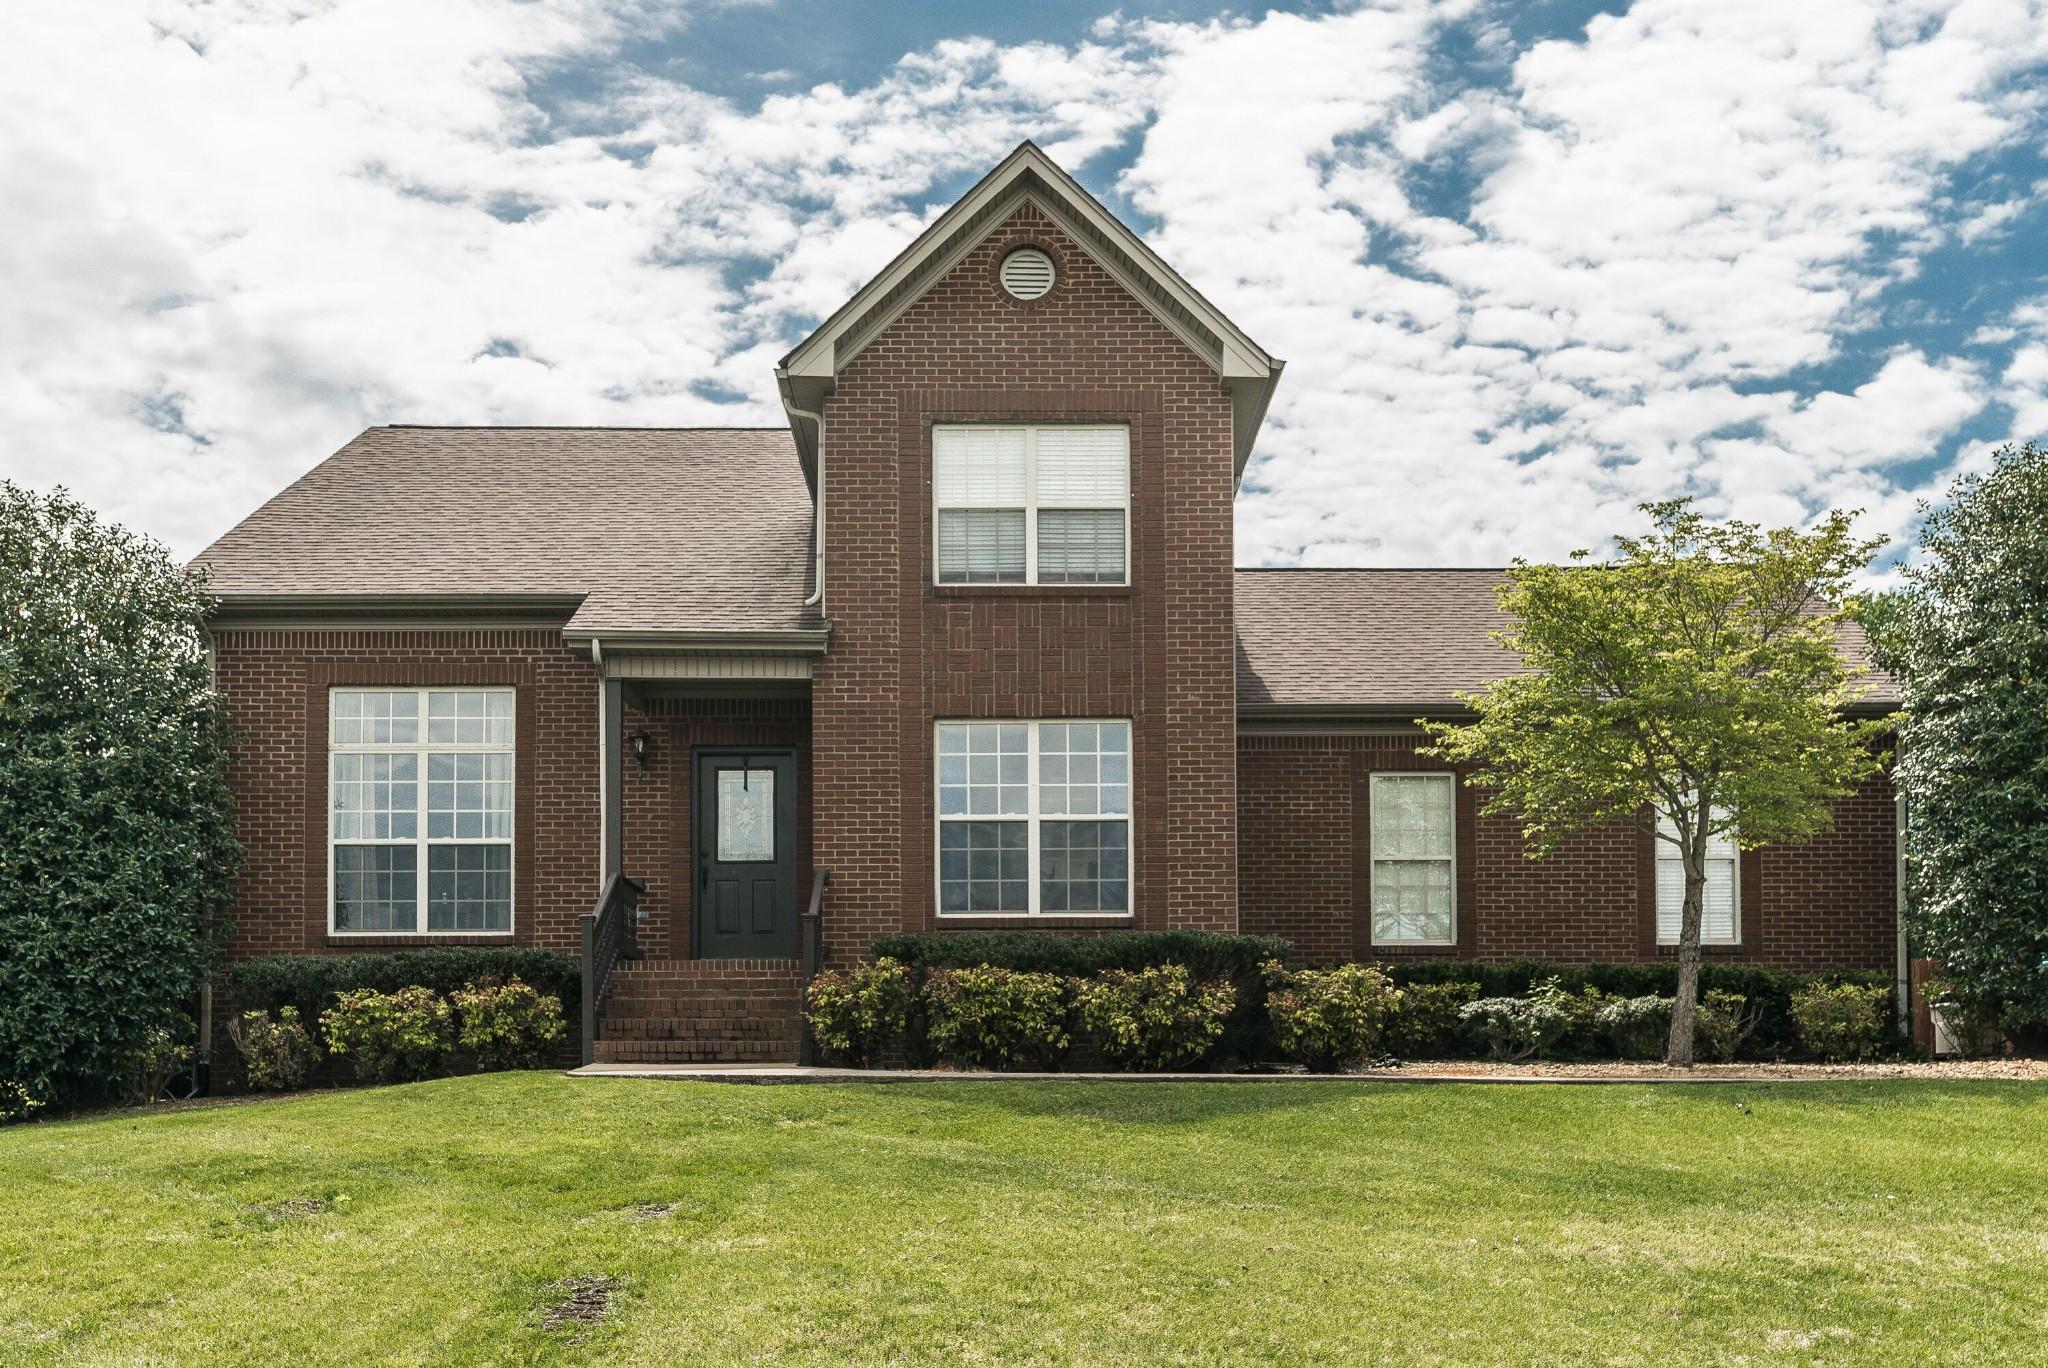 1017 Kacie Dr, Pleasant View, TN 37146 - Pleasant View, TN real estate listing